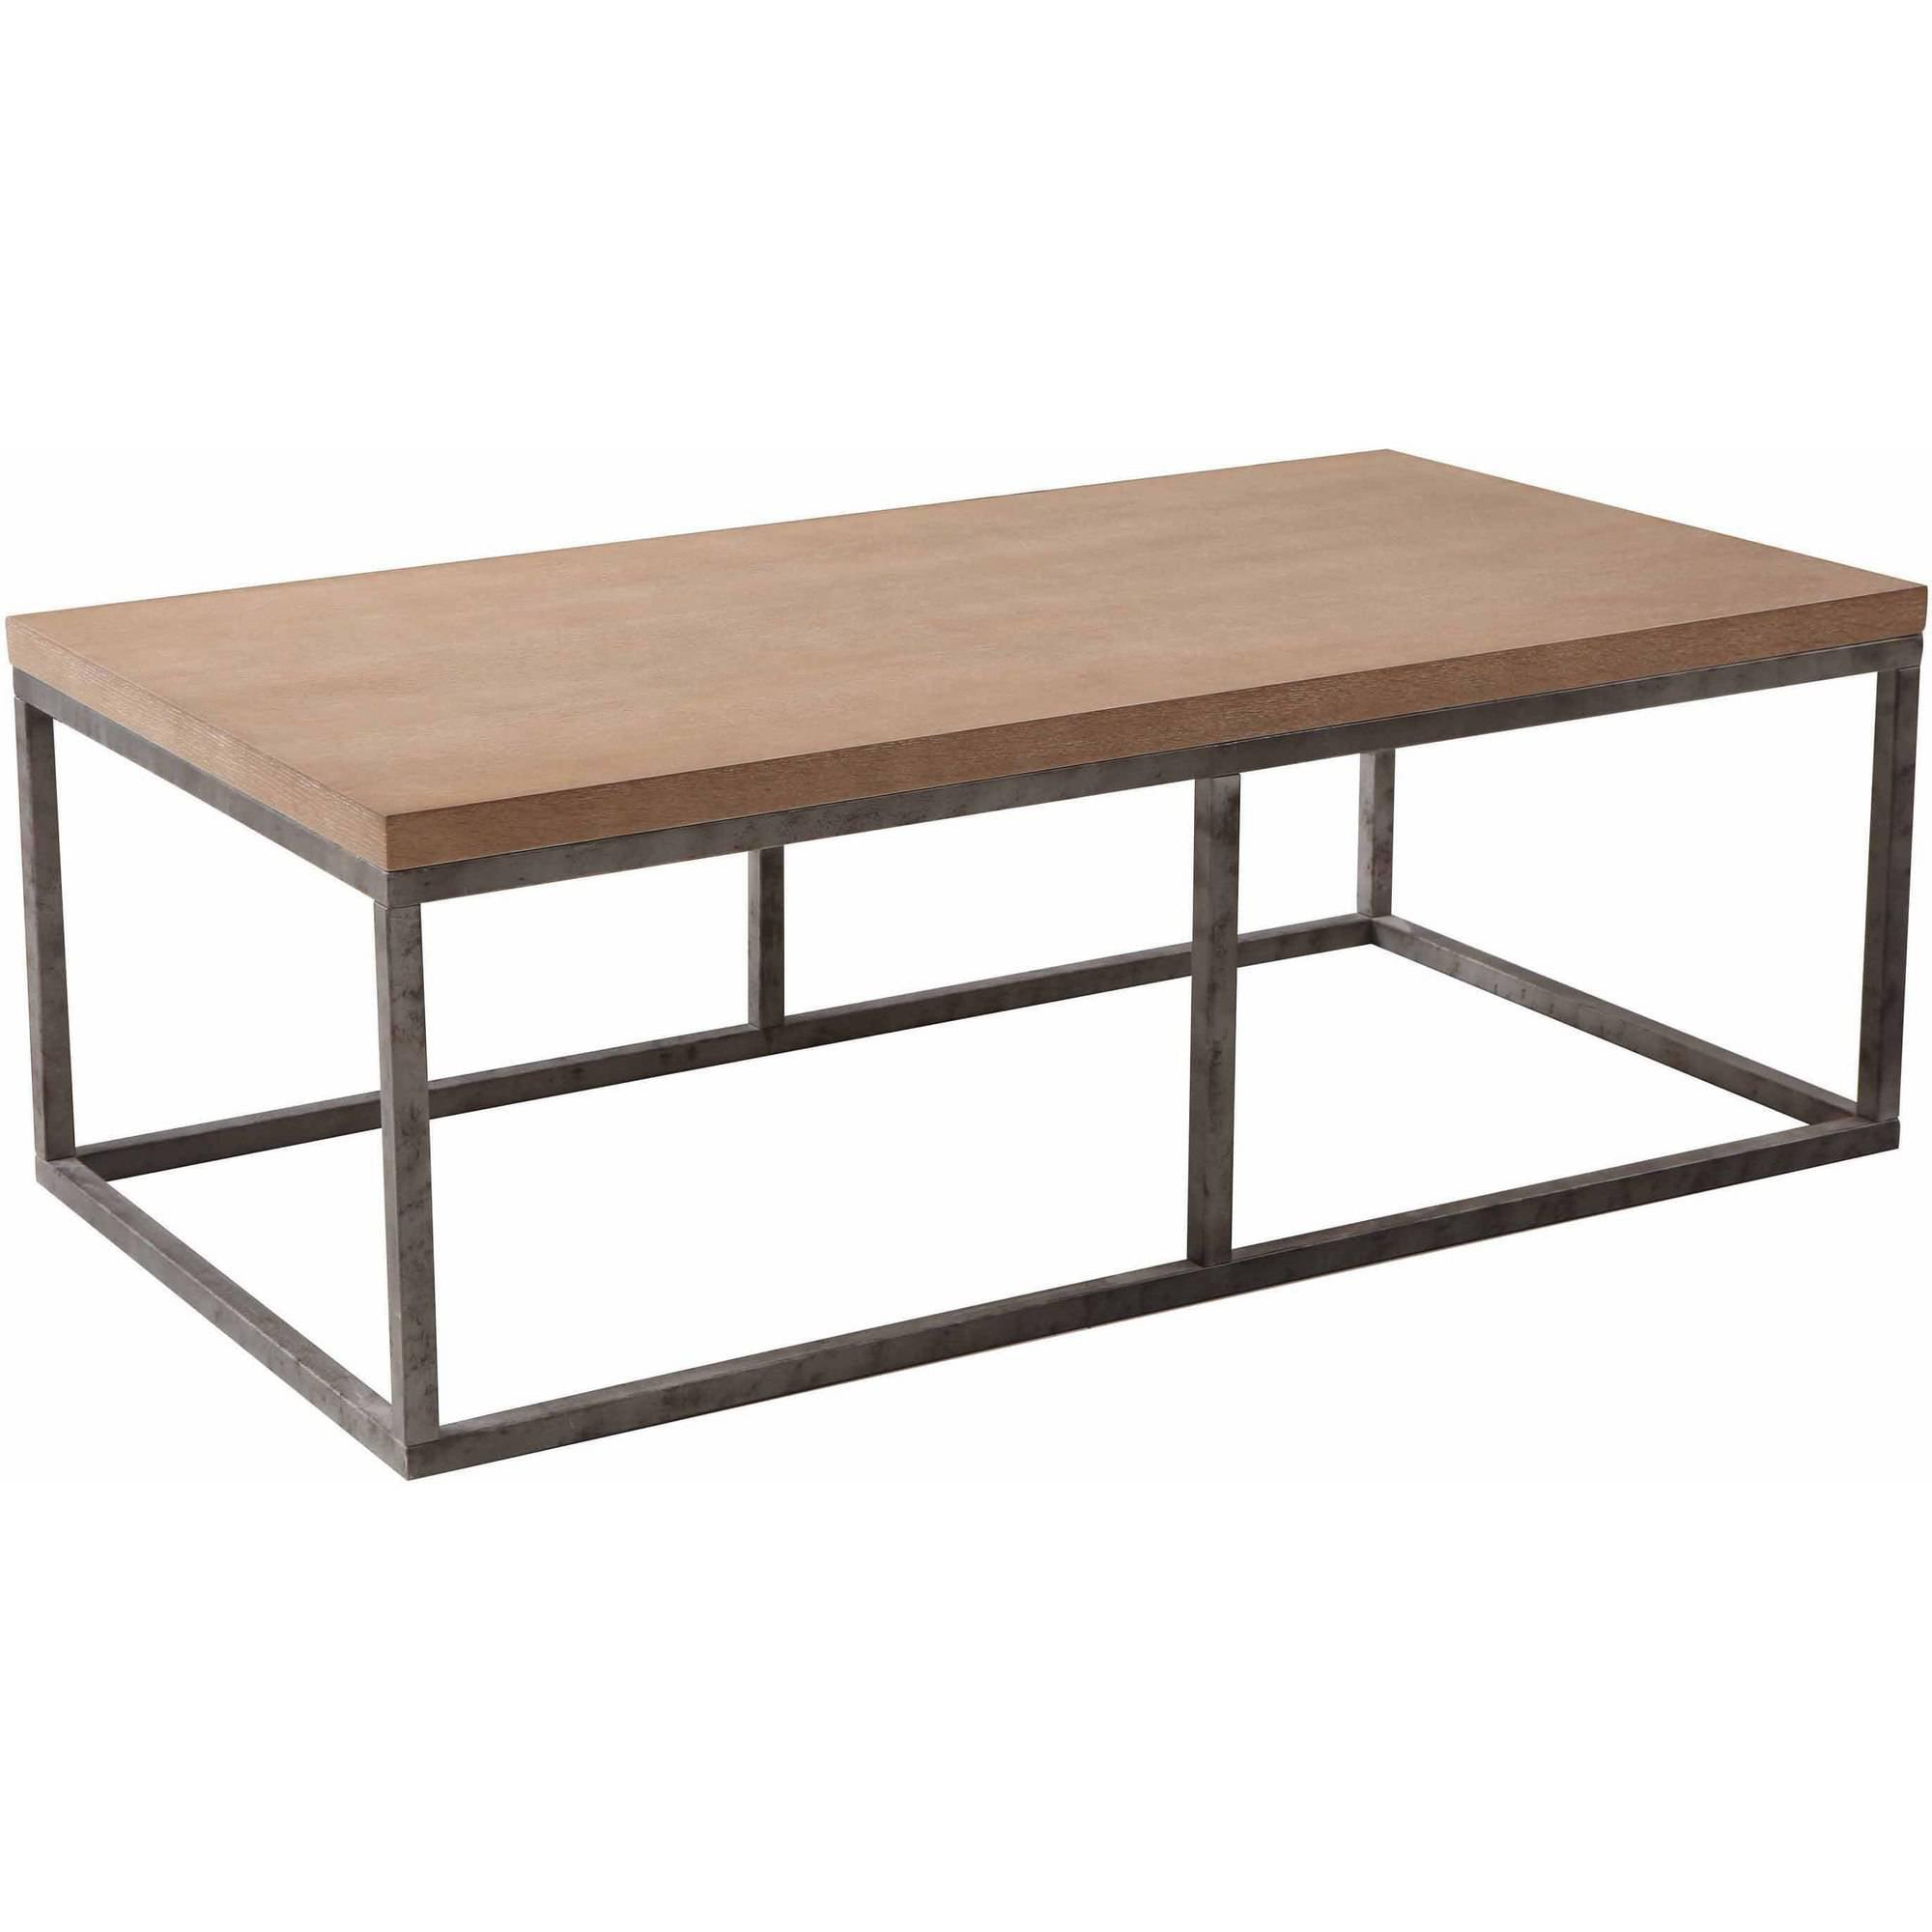 Armen living modern swivel coffee table black and white high armen living modern swivel coffee table black and white high gloss finish walmart geotapseo Images